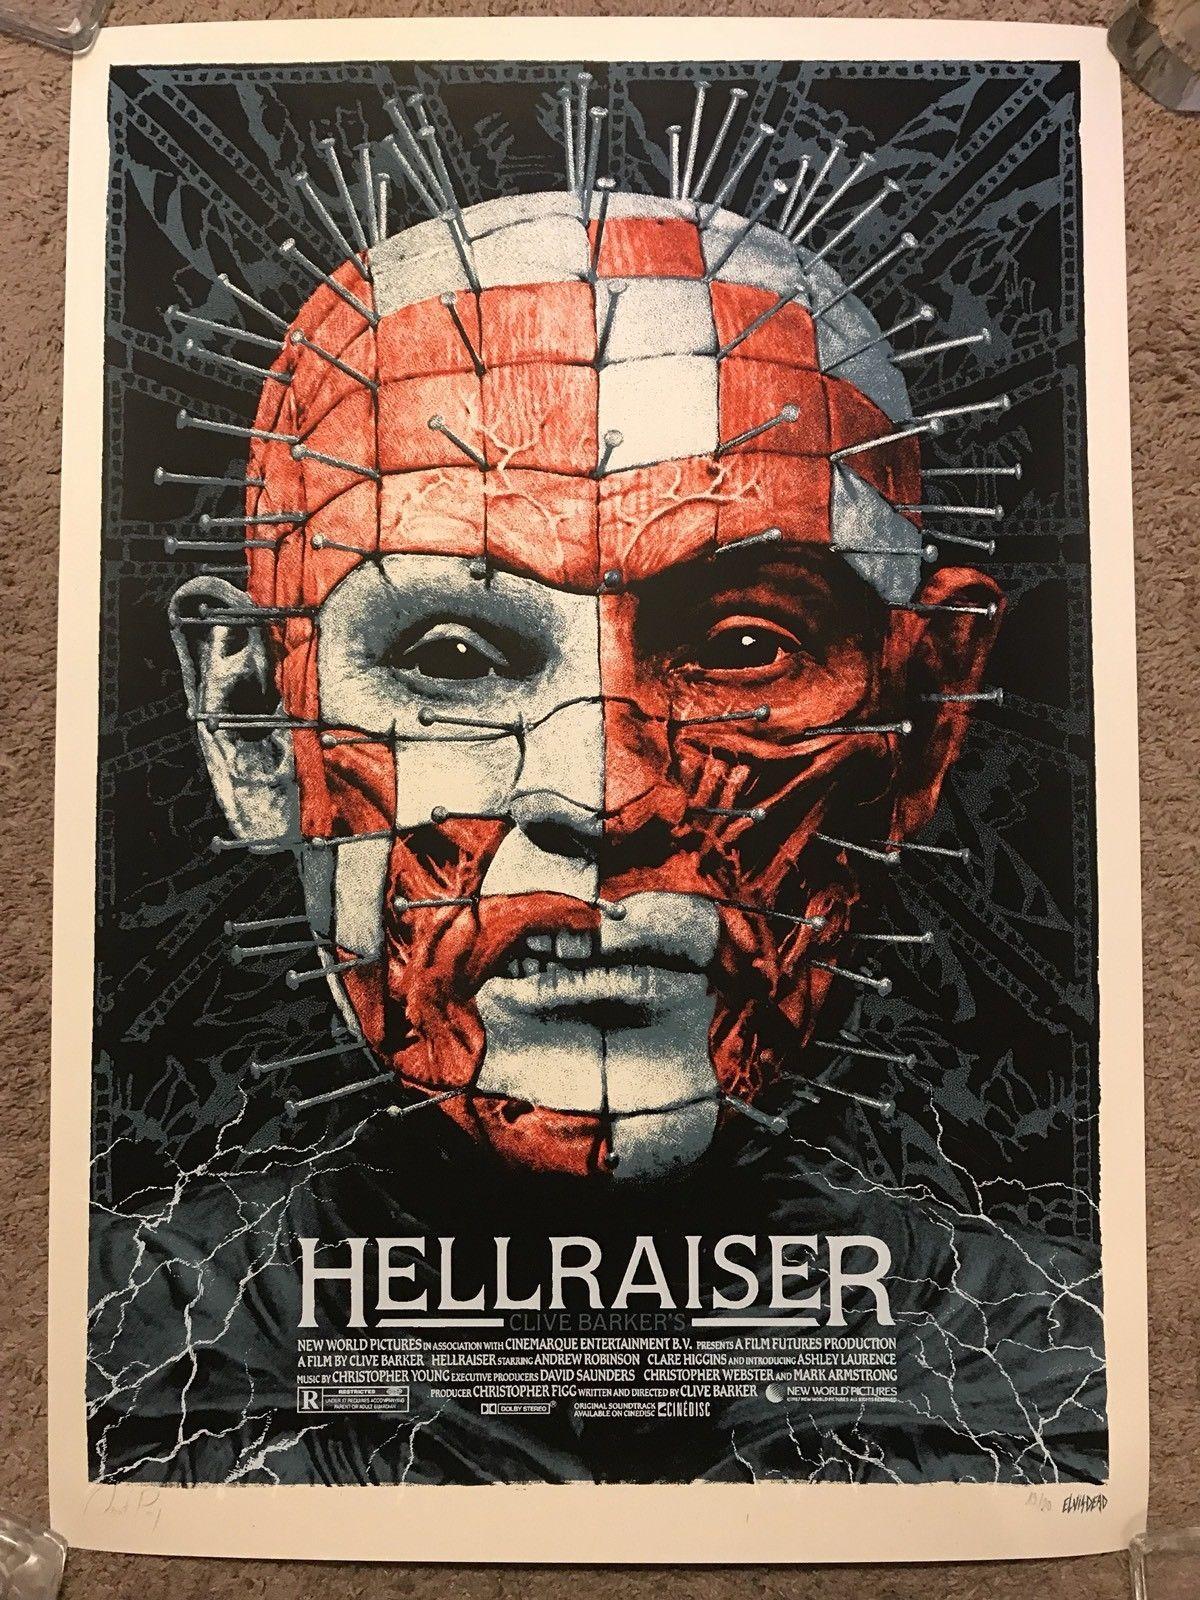 Clive barker hellraiser pinhead art print poster mondo